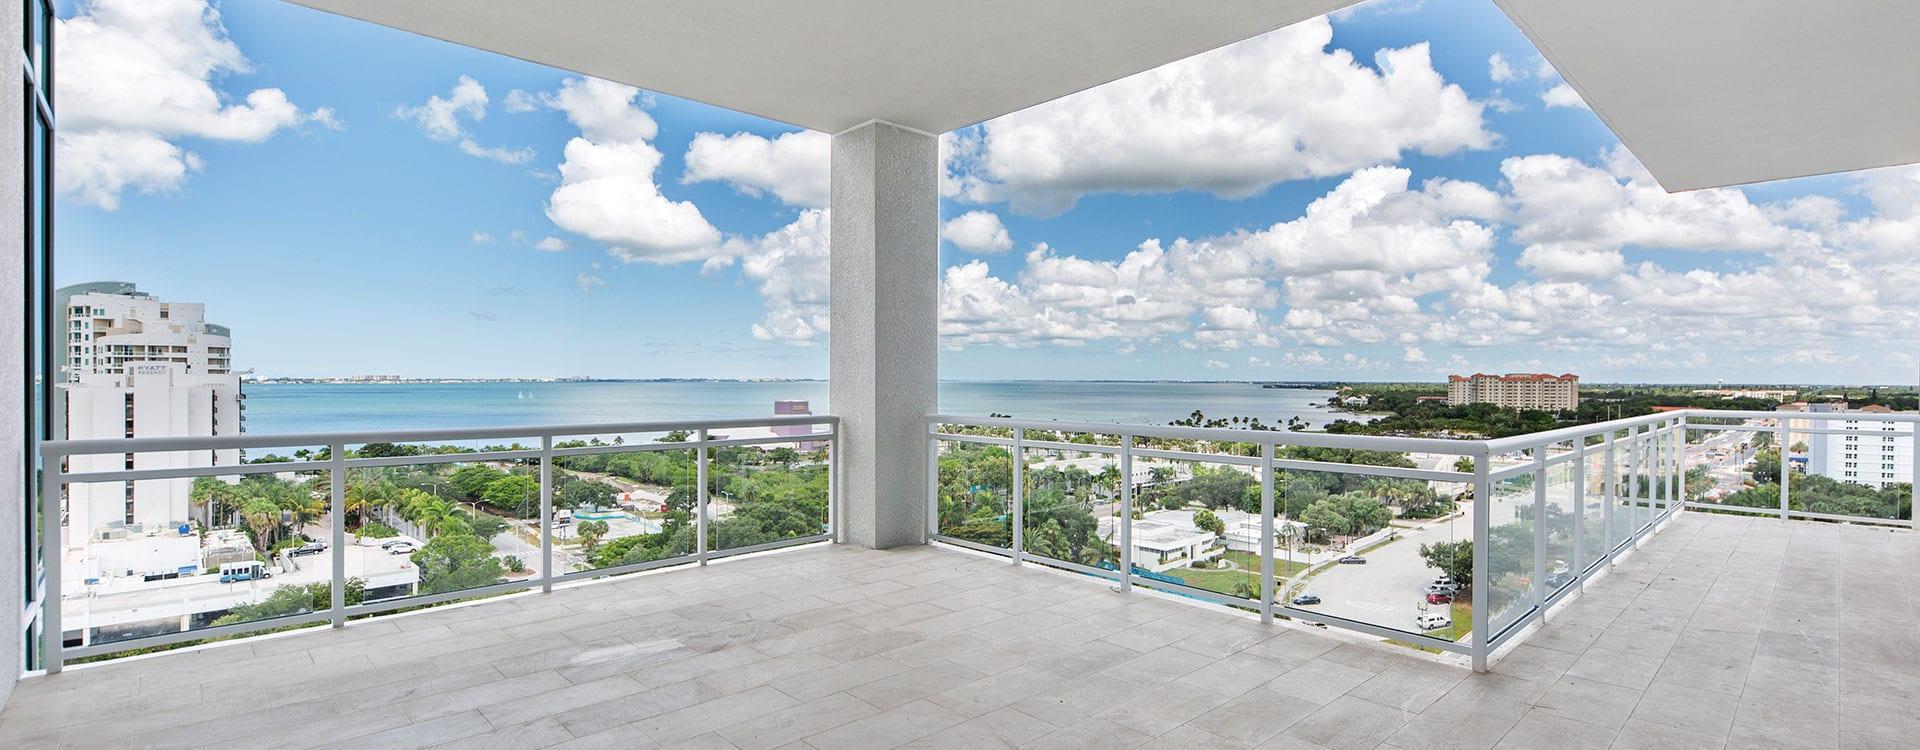 BLVD Sarasota Residence 1102 Terrace